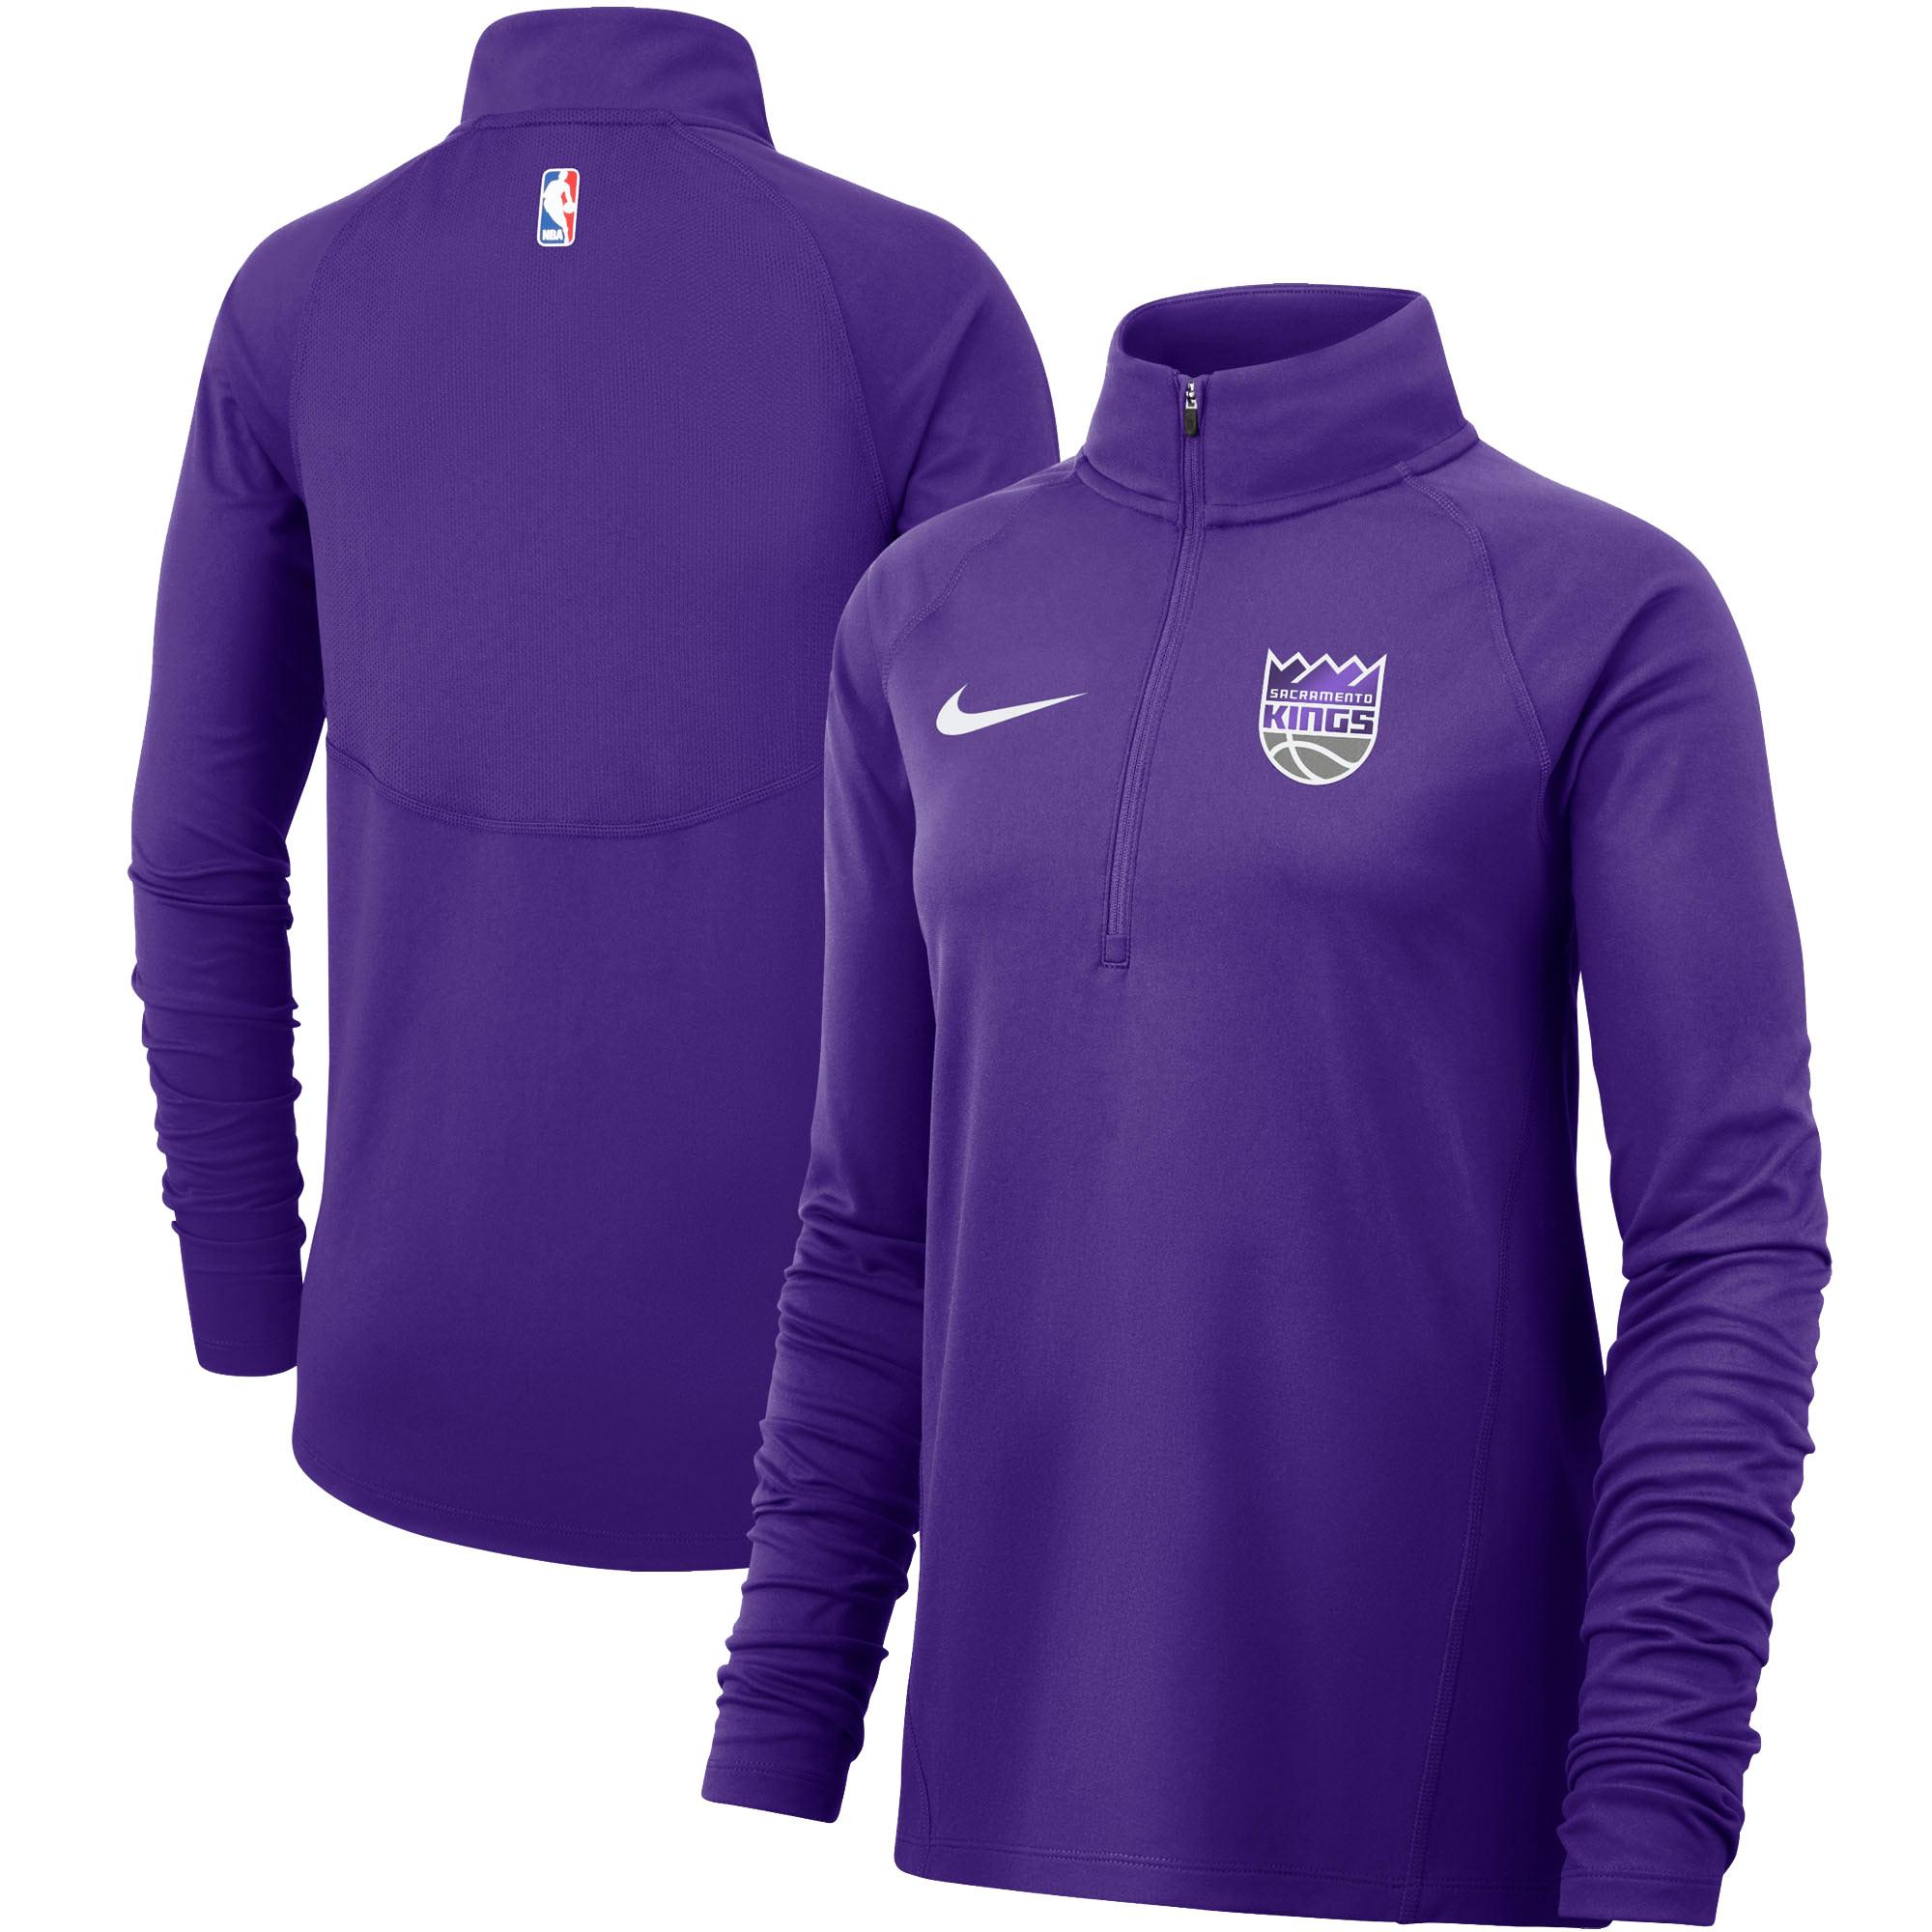 Sacramento Kings Nike Women's Element Performance Raglan Sleeve Half-Zip Pullover Jacket - Purple